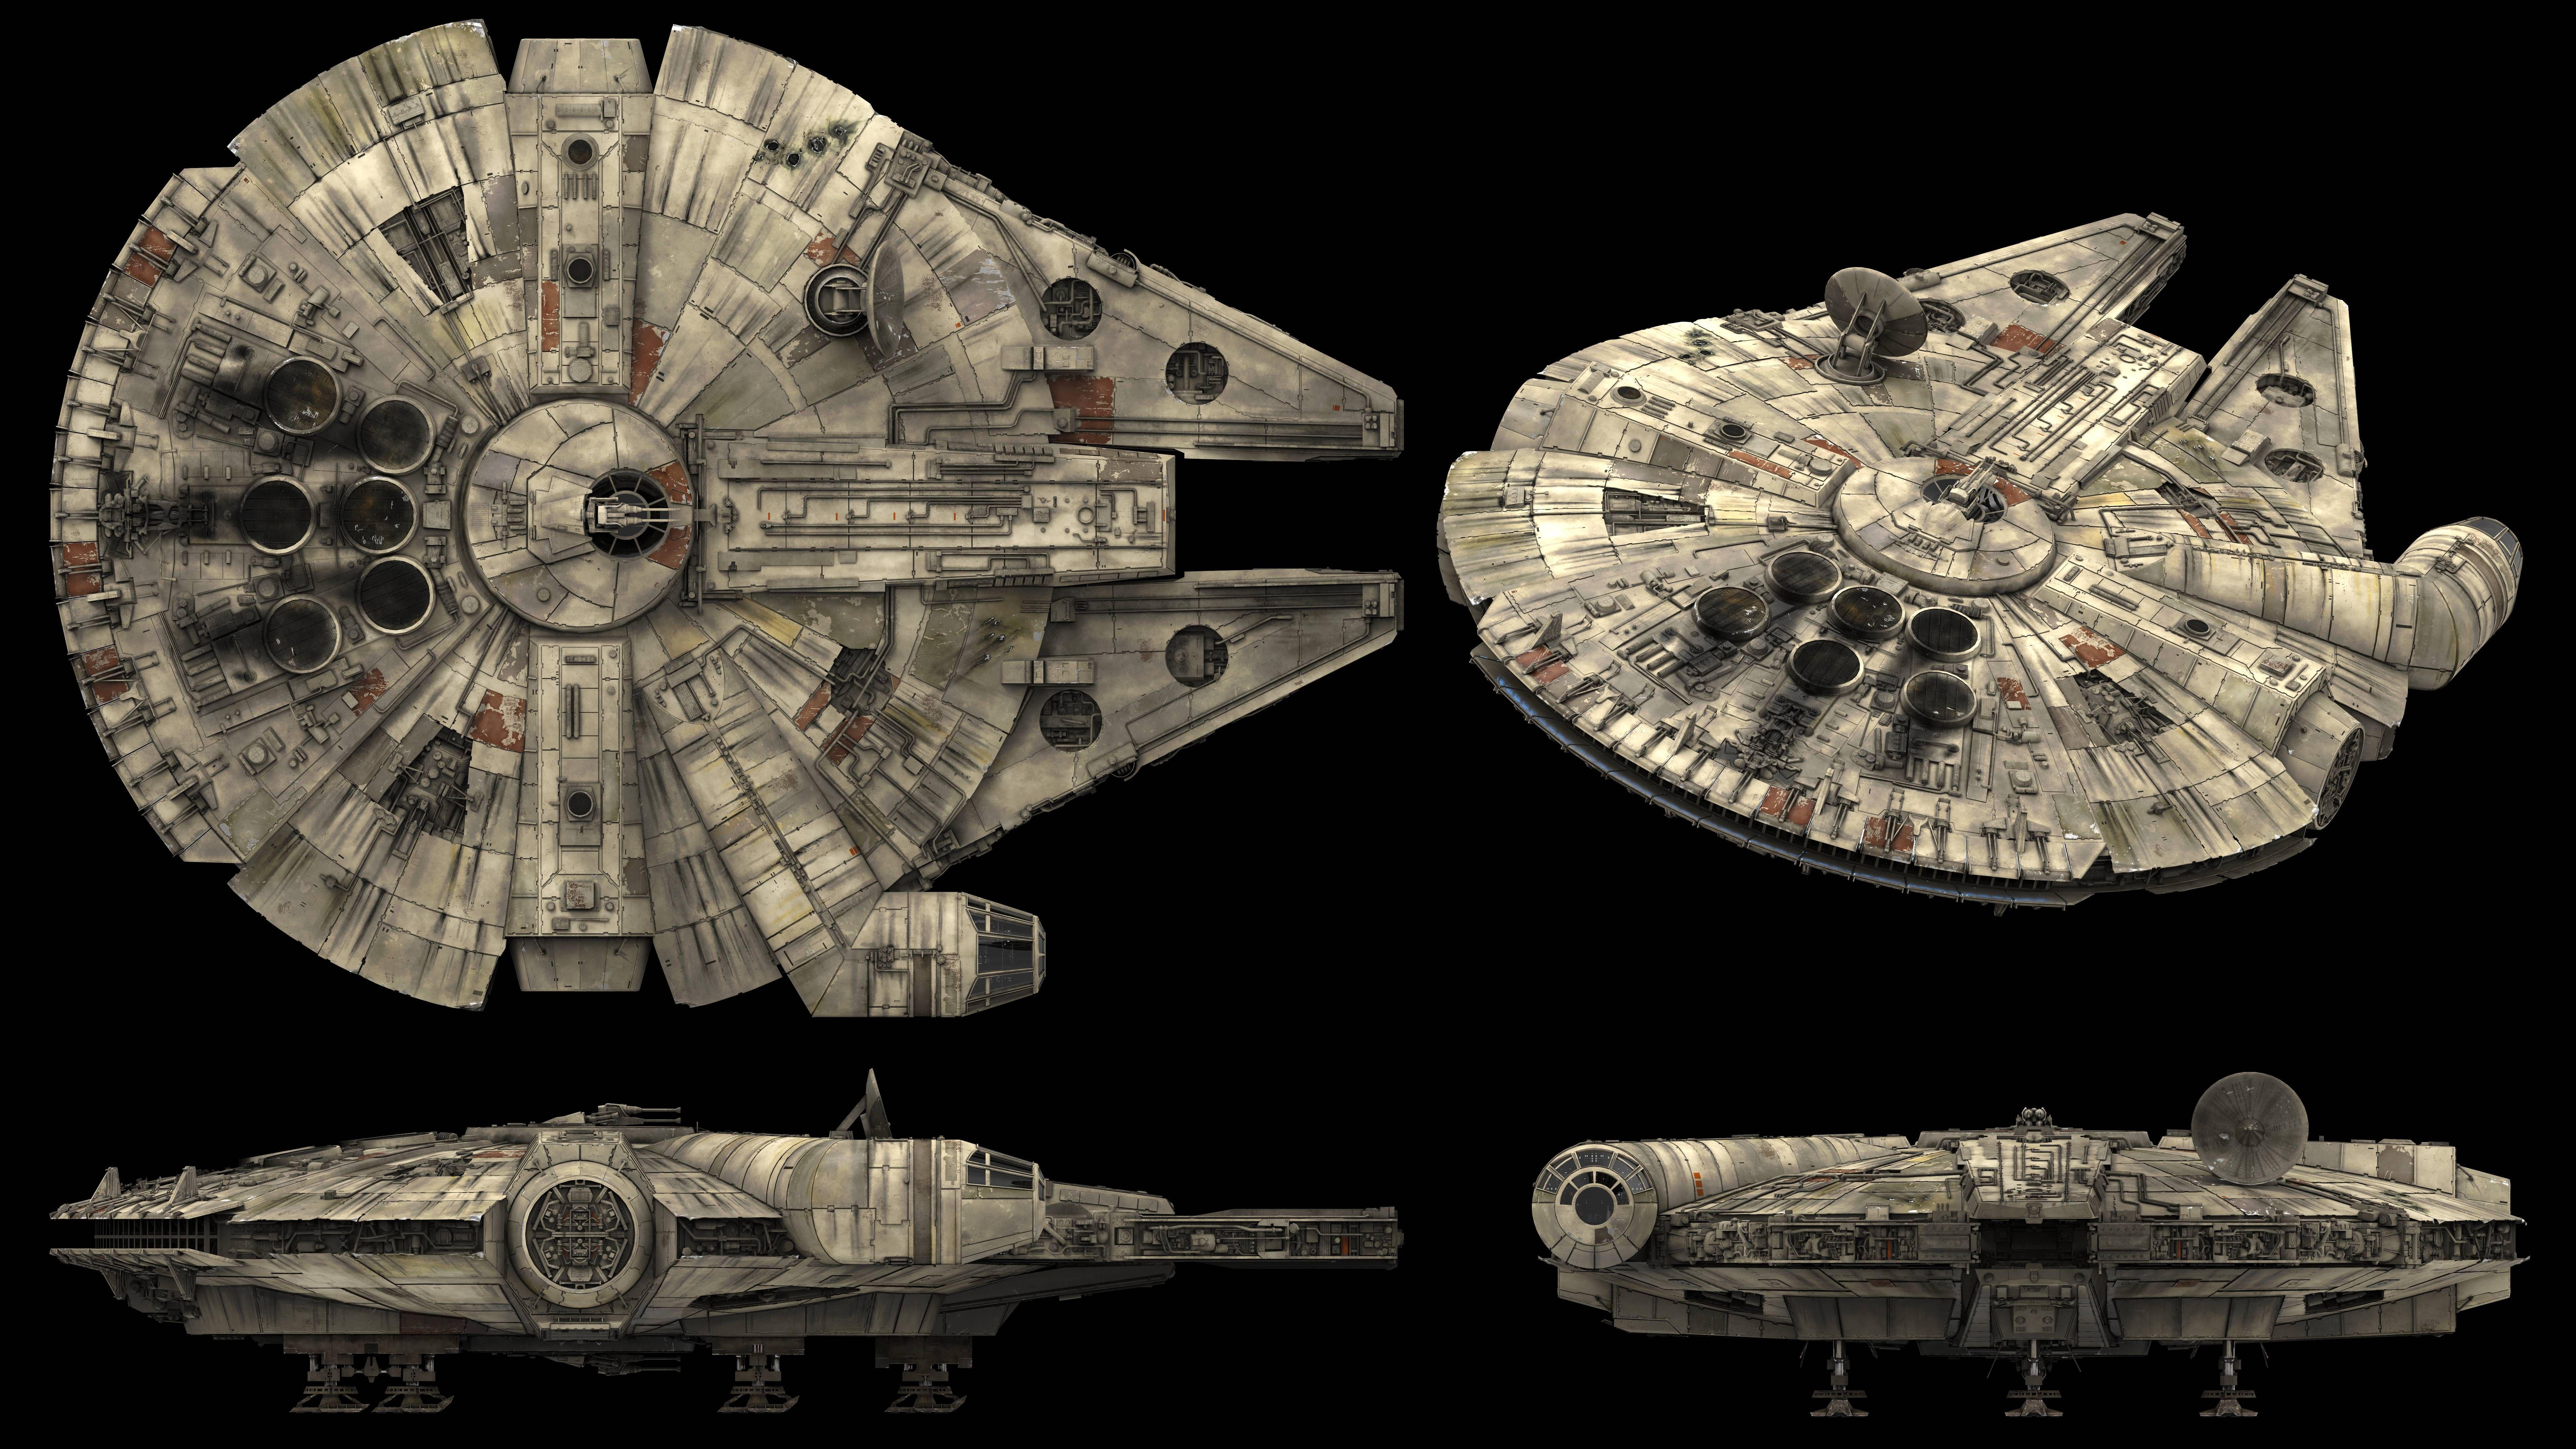 Millennium Falcon Side View Star Wars Wallpaper Star Wars Poster Millennium Falcon